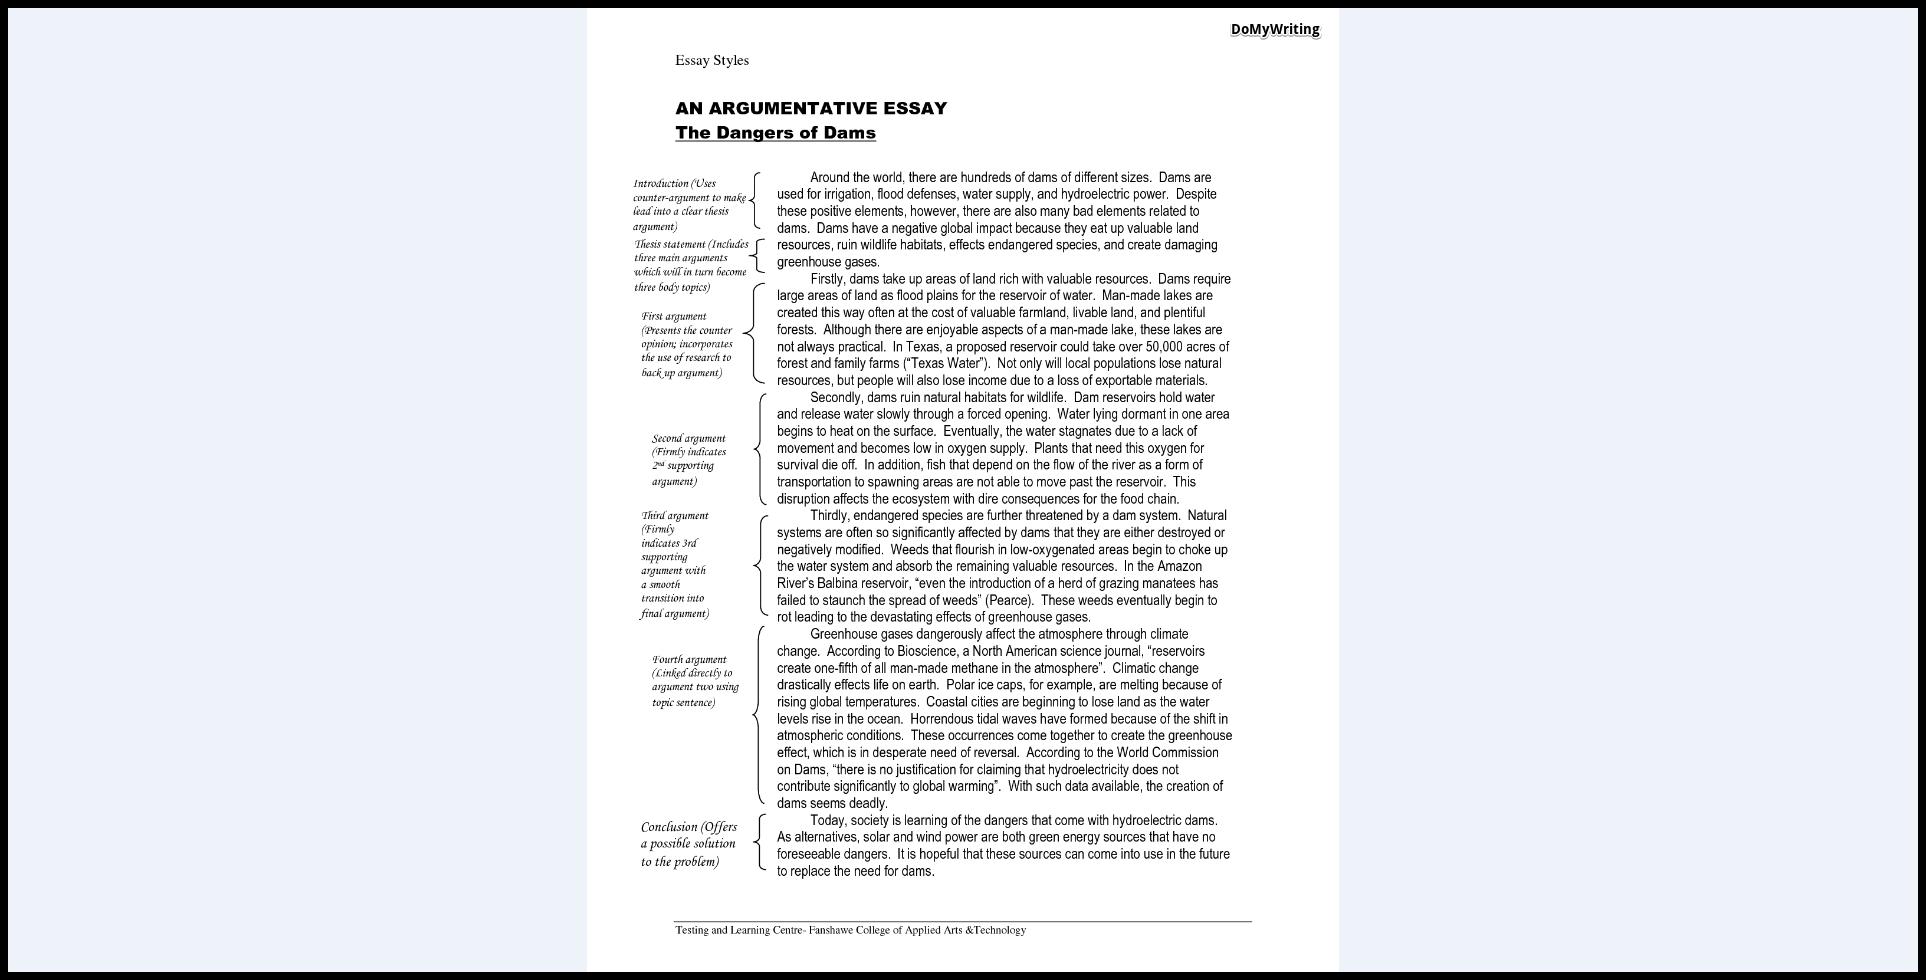 013 Argumentative Research Essay Topicss Singular Topics Great 2018 Easy Full